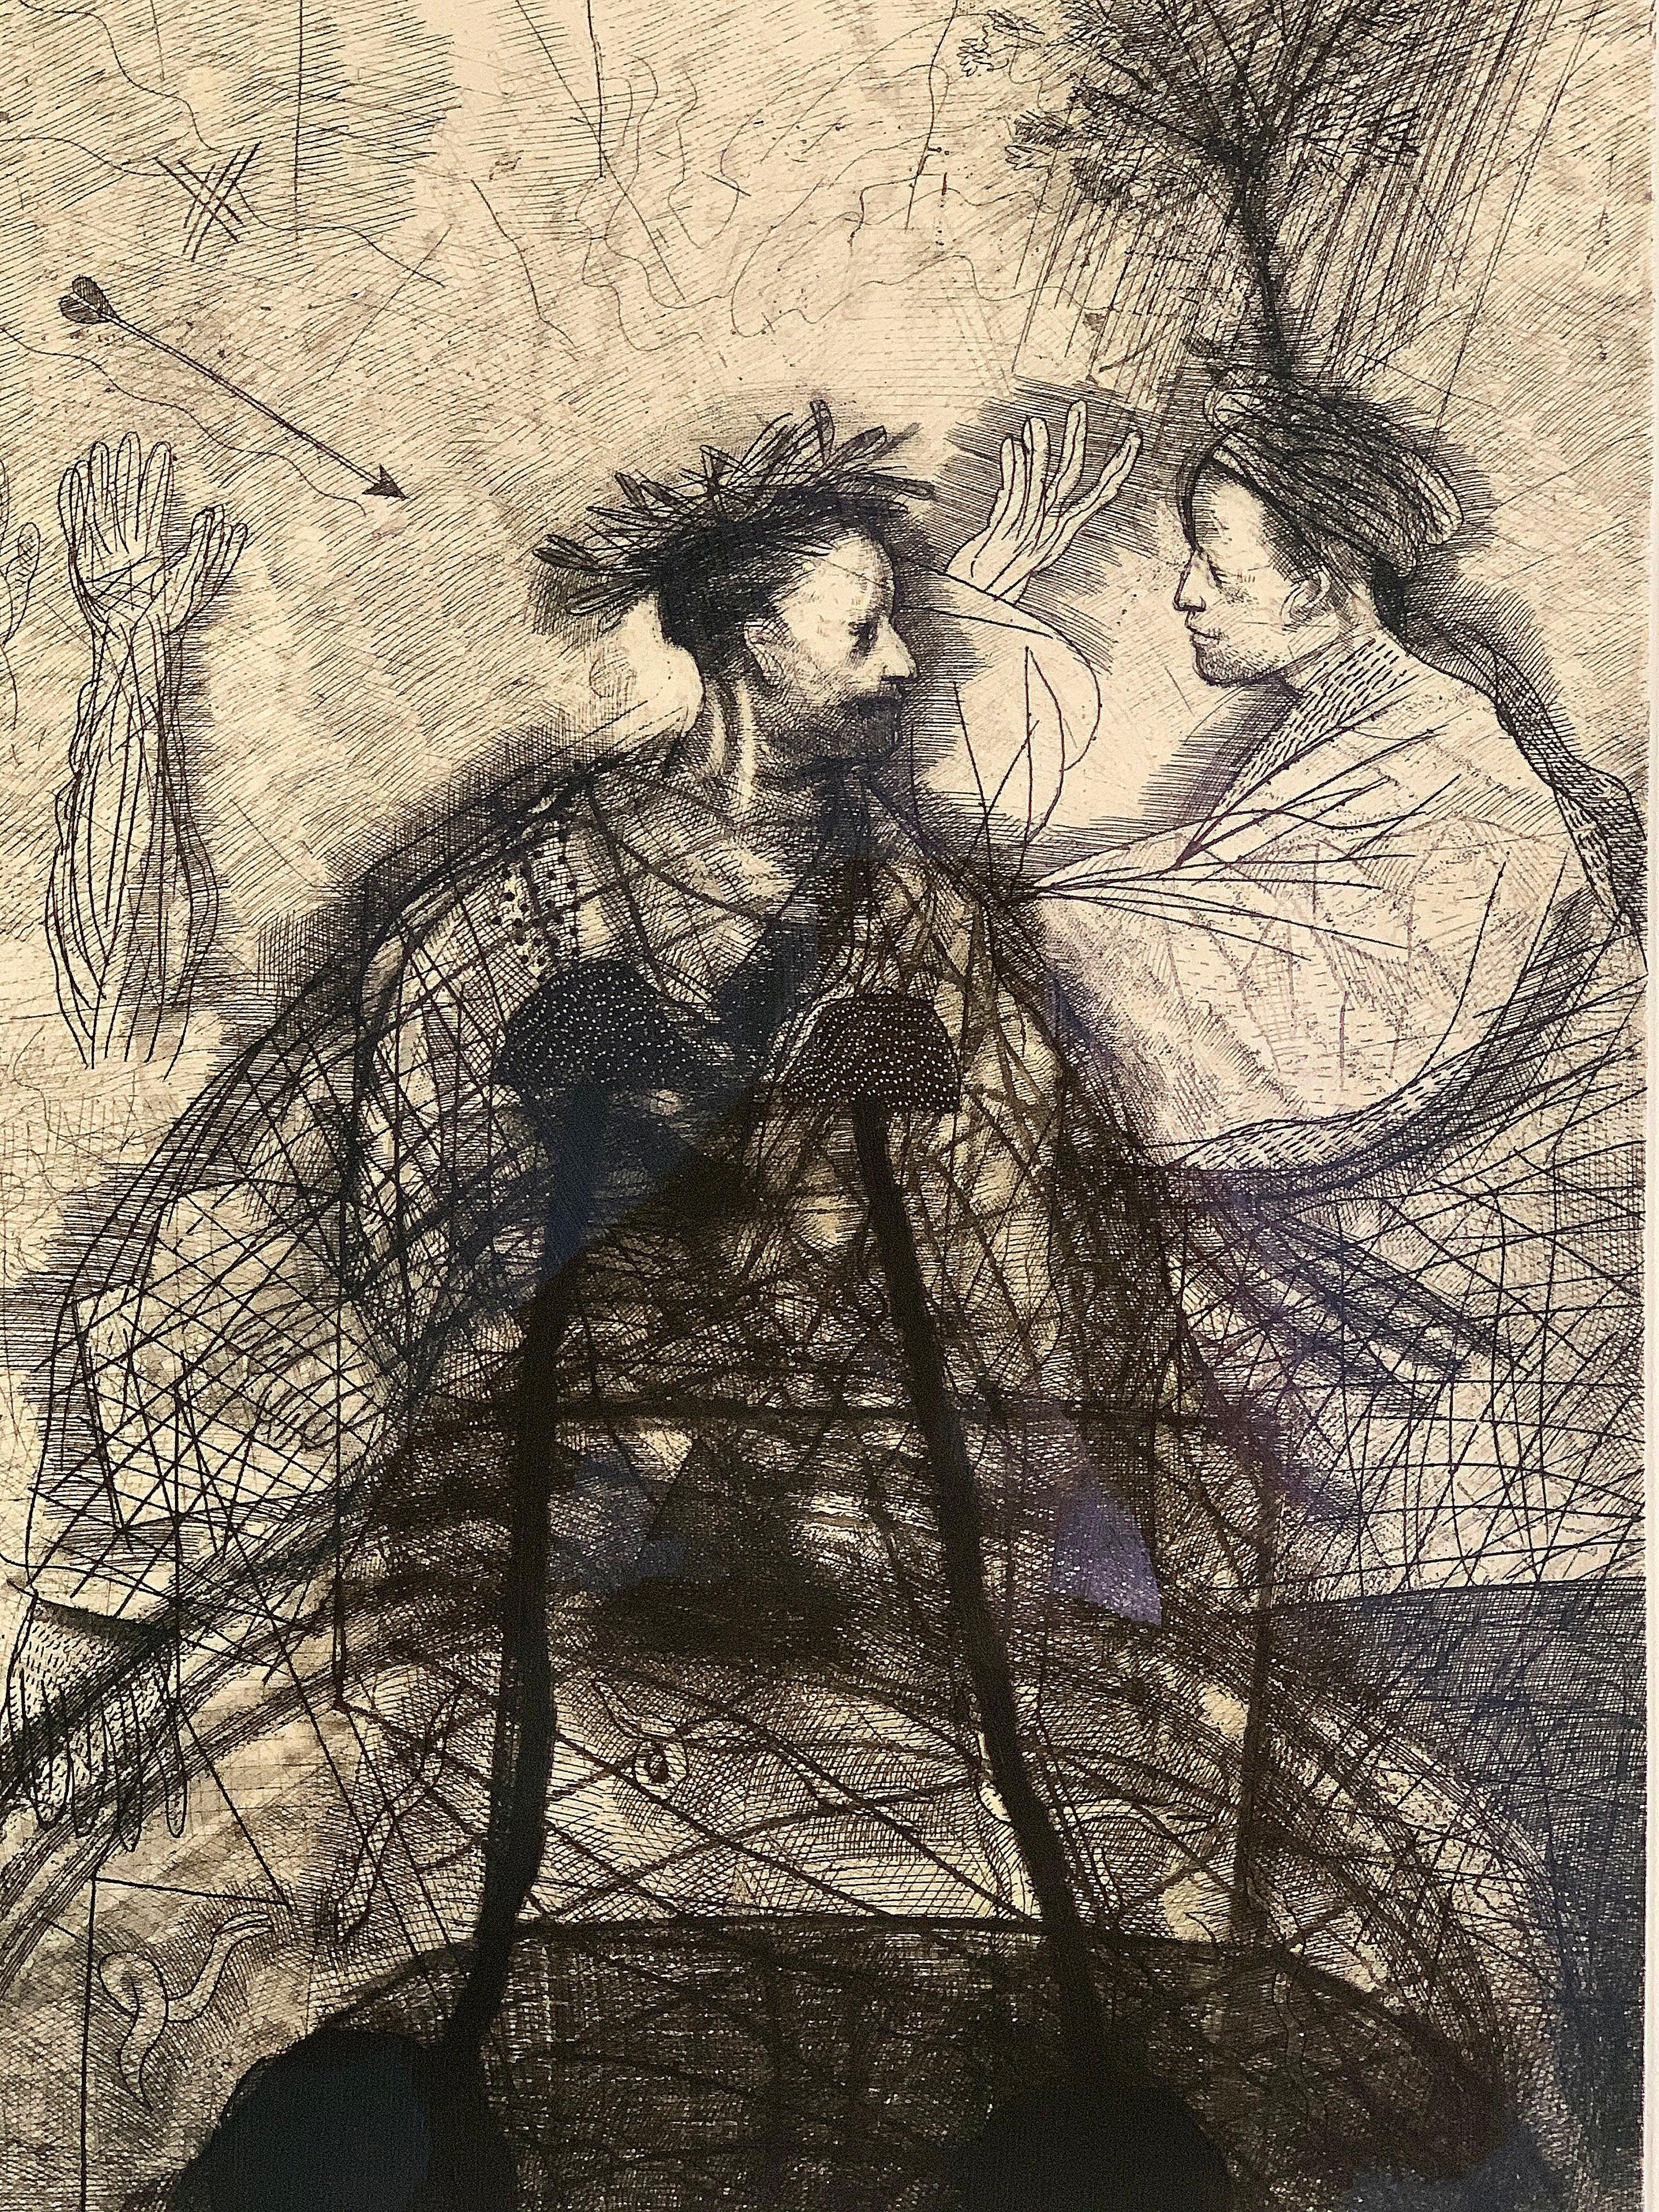 Untitled Figurative by Miguel Conde, No. 102/150